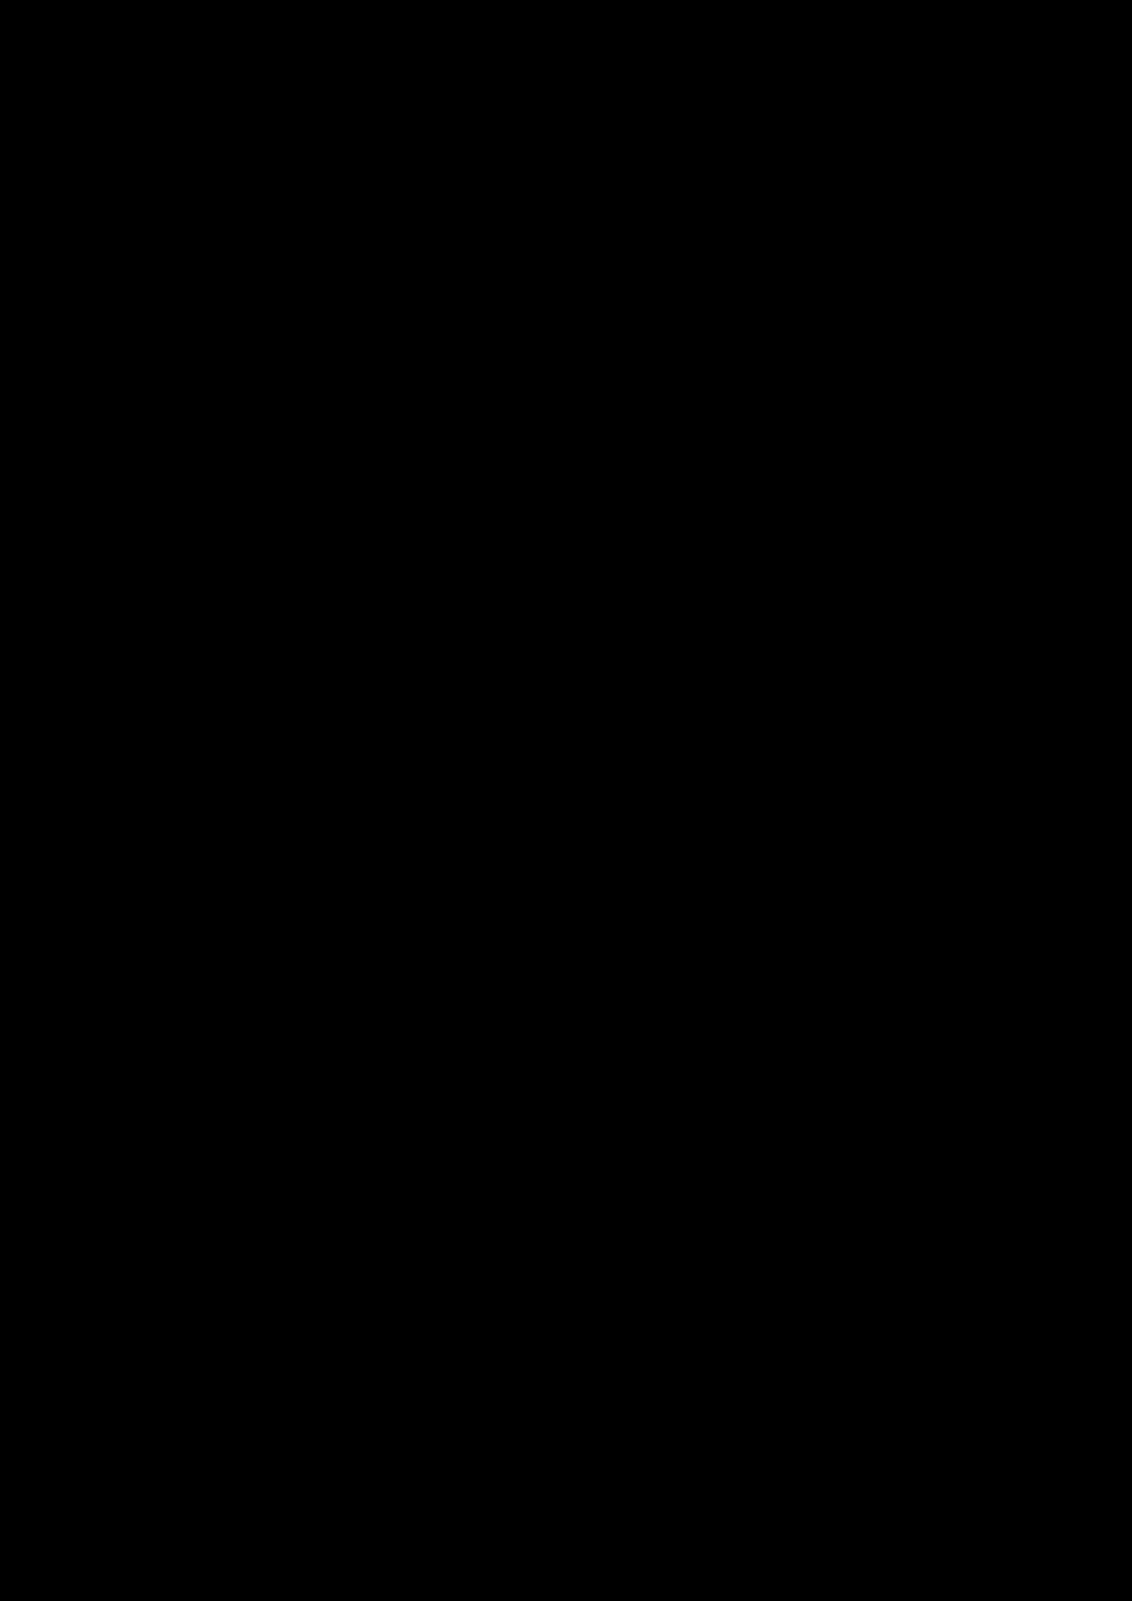 Romans o sleze slide, Image 29